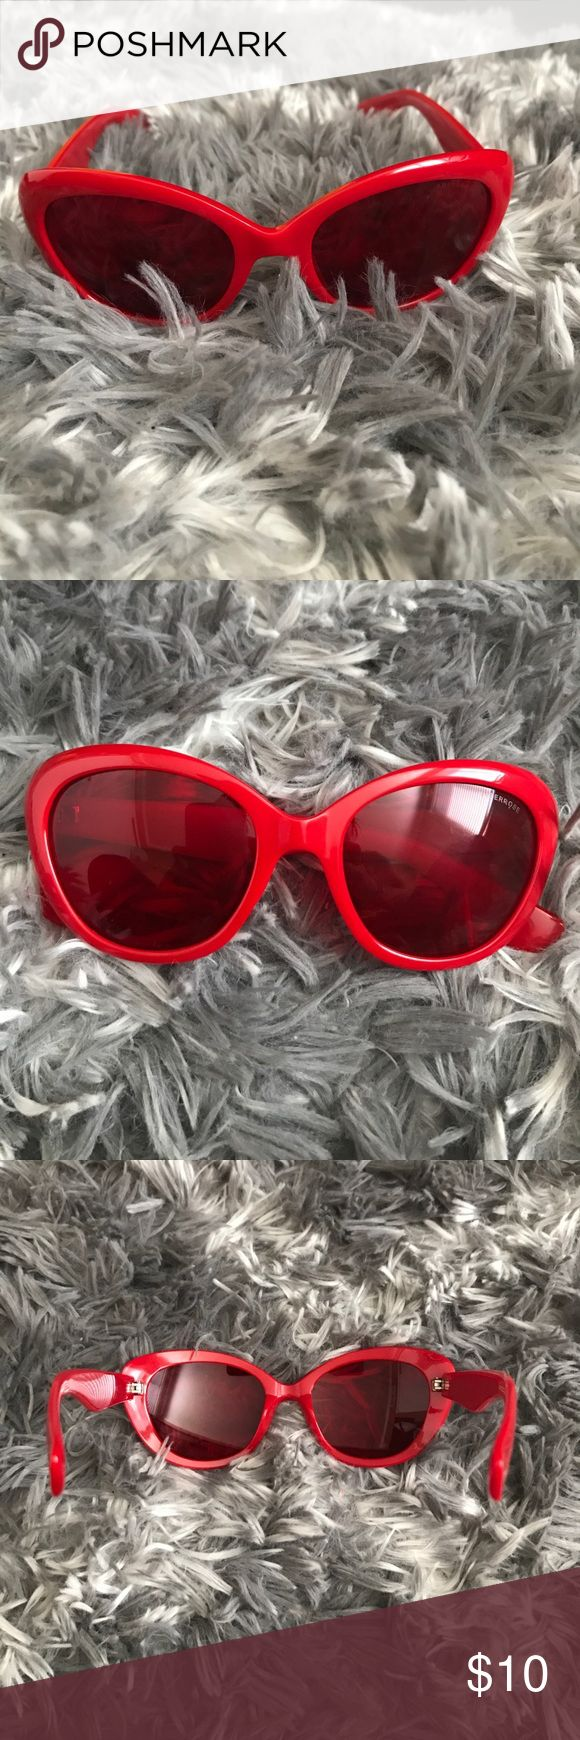 Amber Rose Sunglasses Amber Rose red sunglasses amber rose Accessories Sunglasses